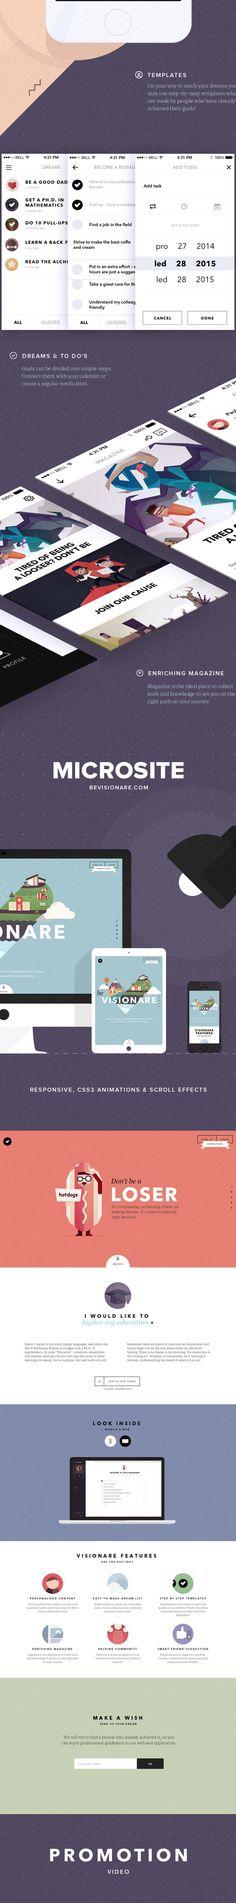 Visionare IOS Mobile App by Pavel Novák, via Behance